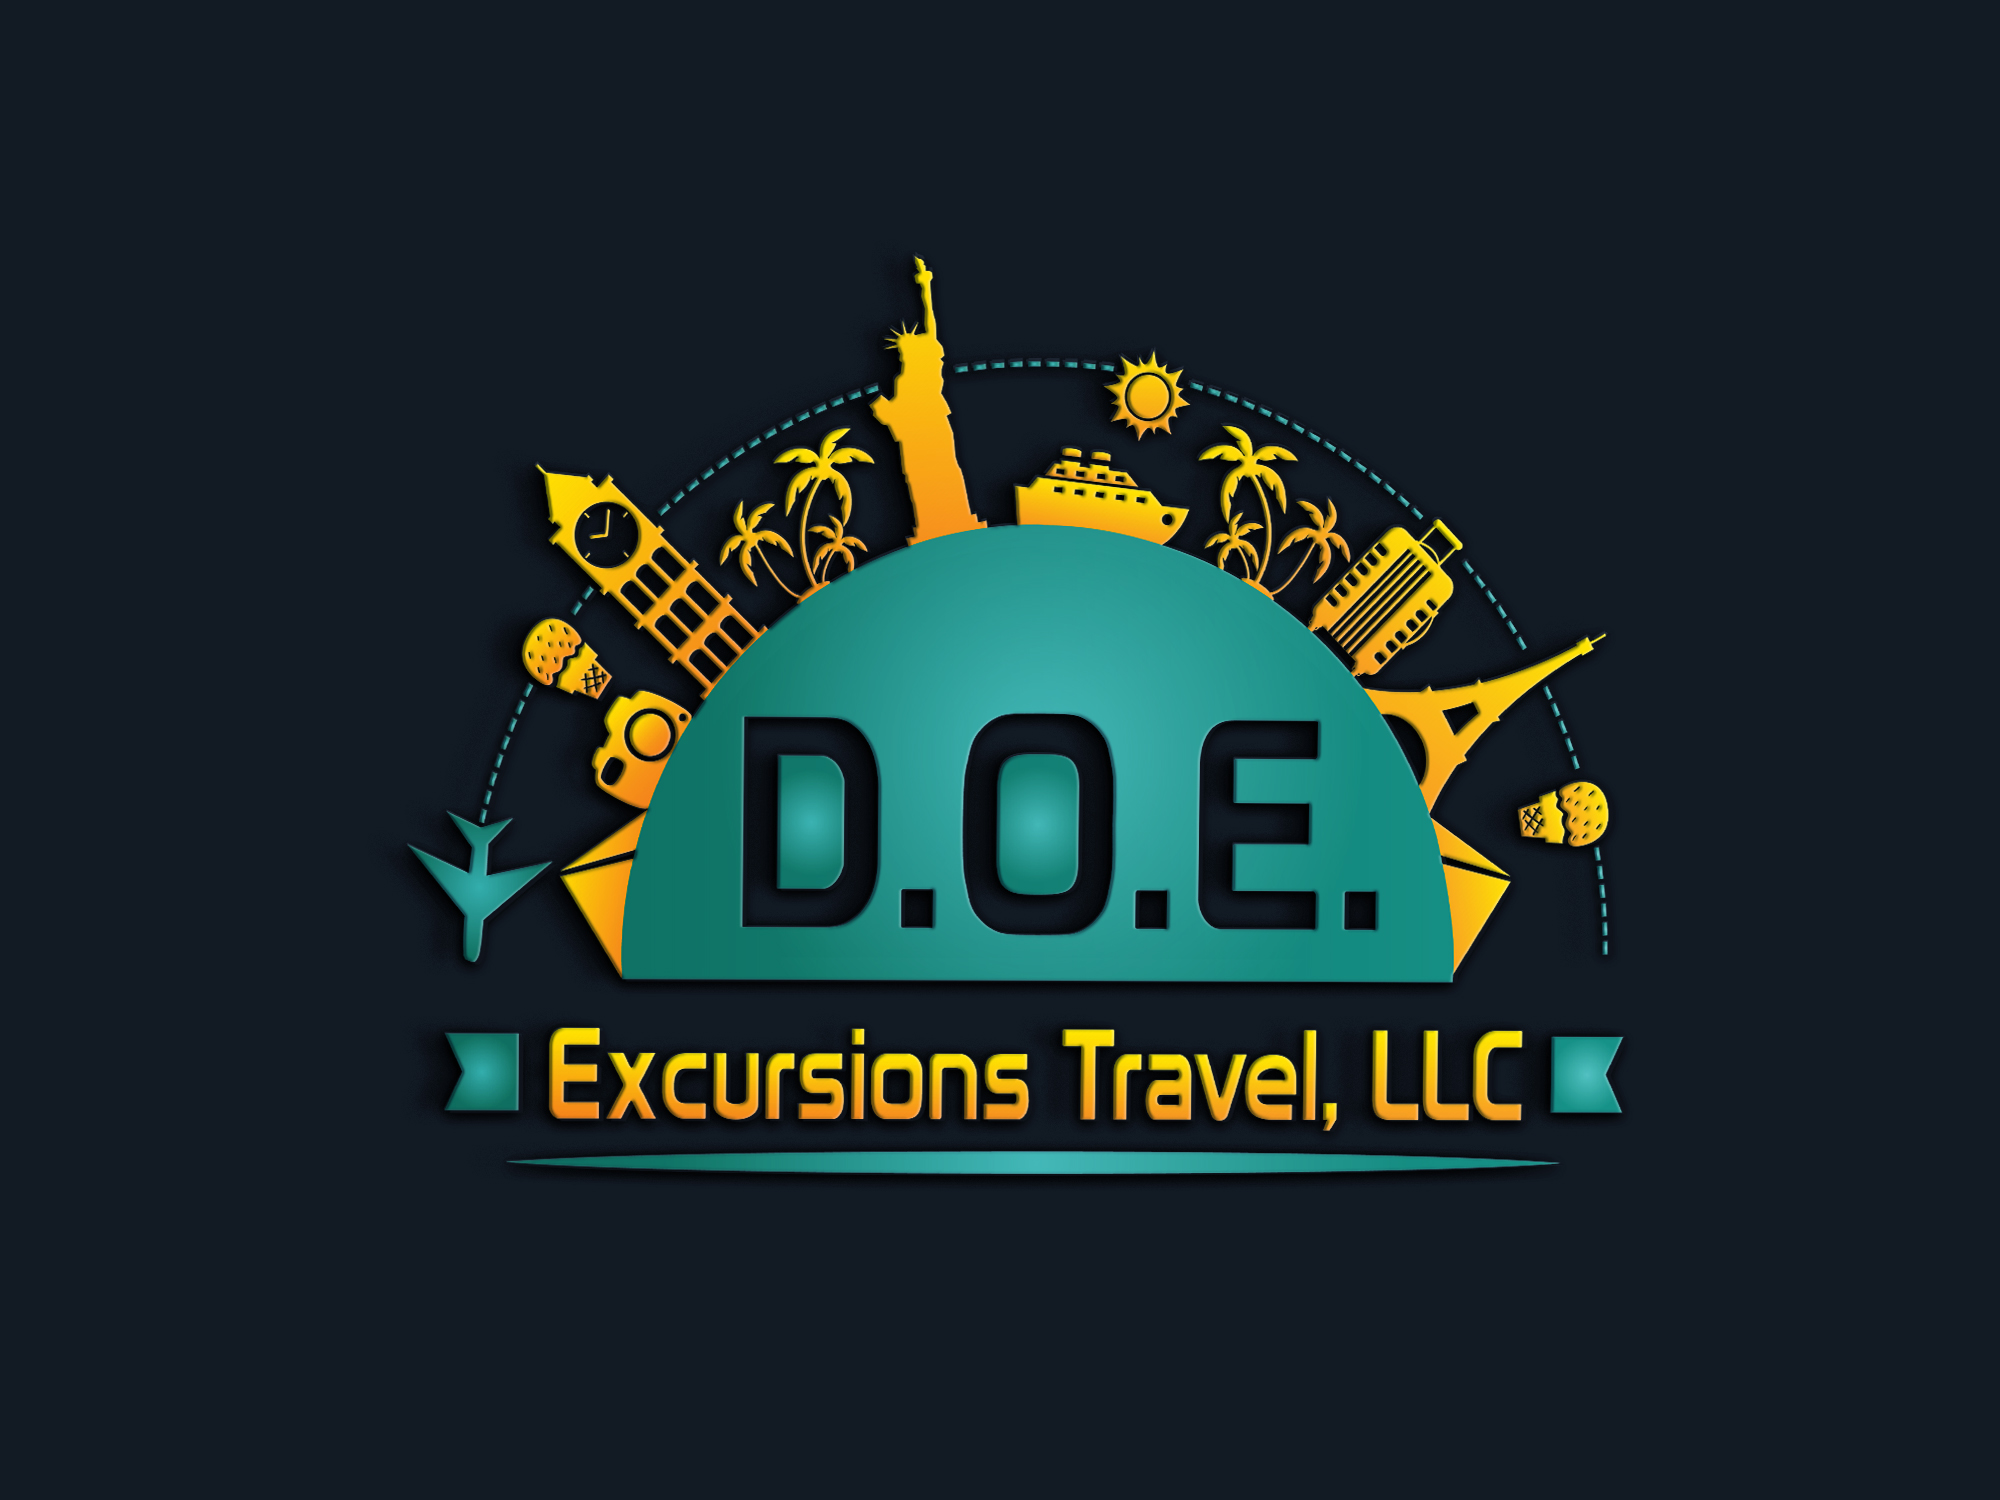 D.O.E. Excursions Travel, LLC